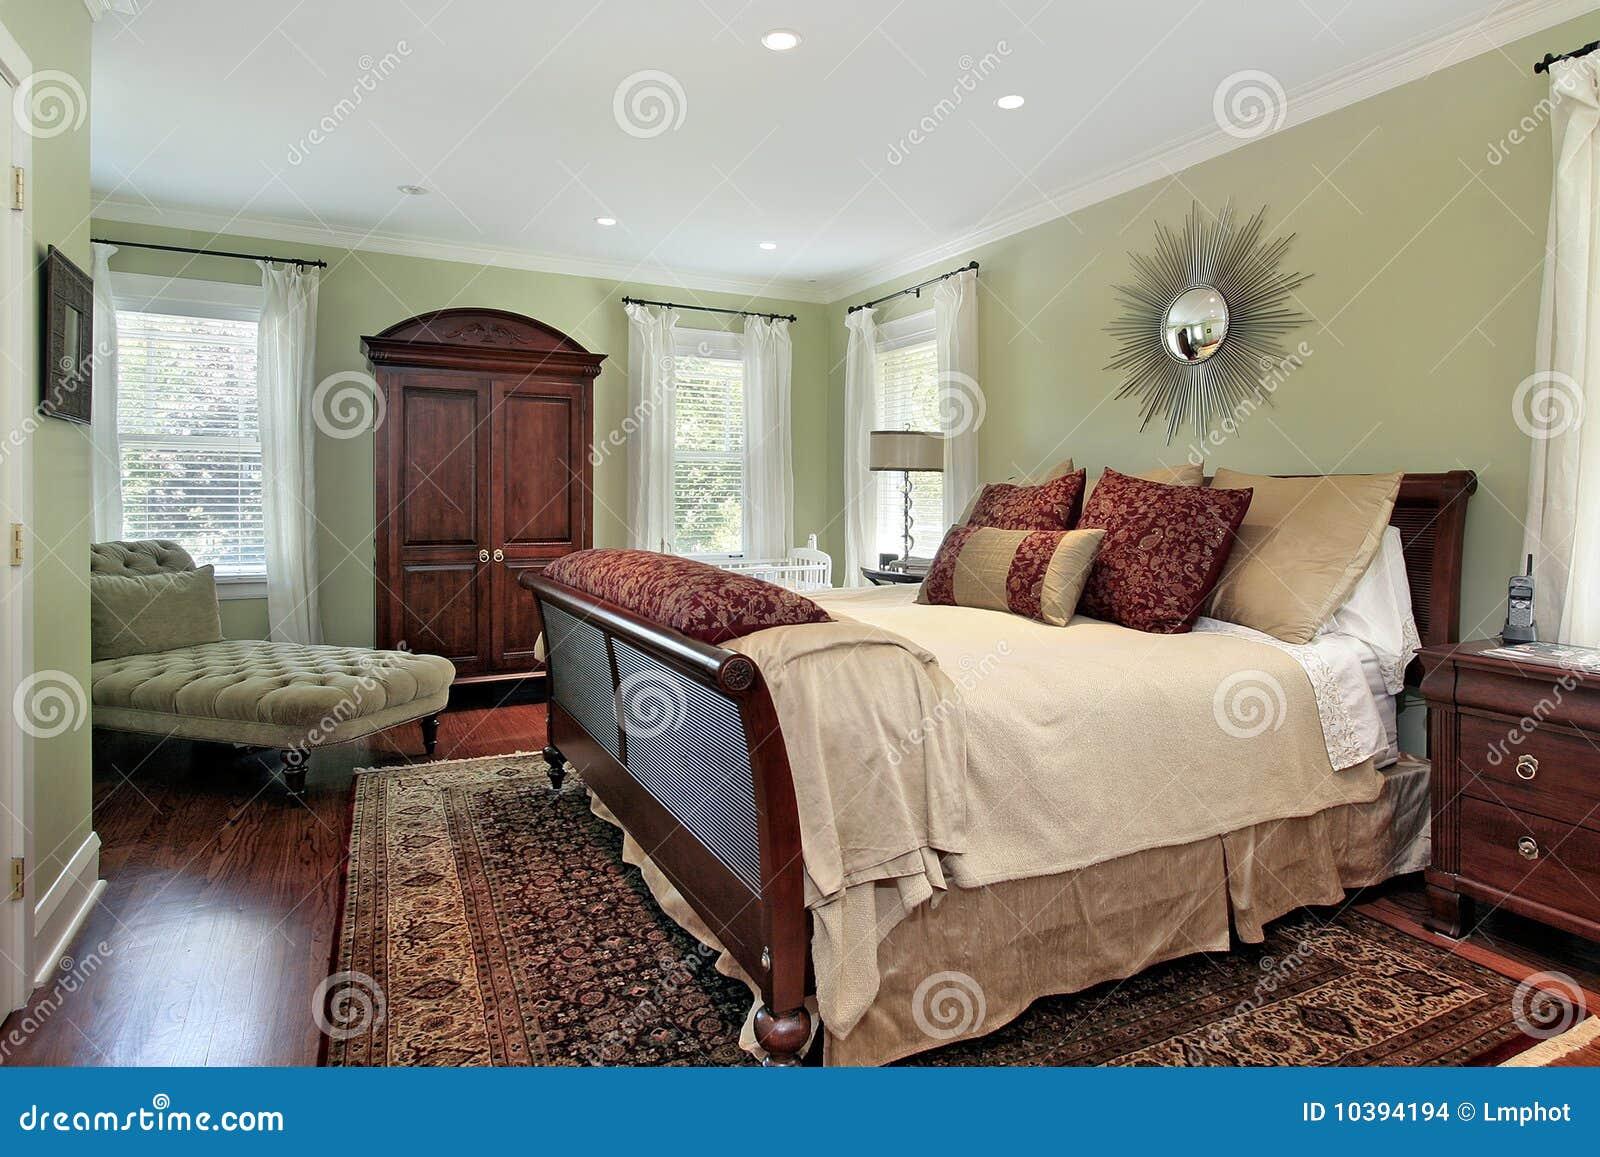 https://thumbs.dreamstime.com/z/hoofd-slaapkamer-met-groene-muren-10394194.jpg